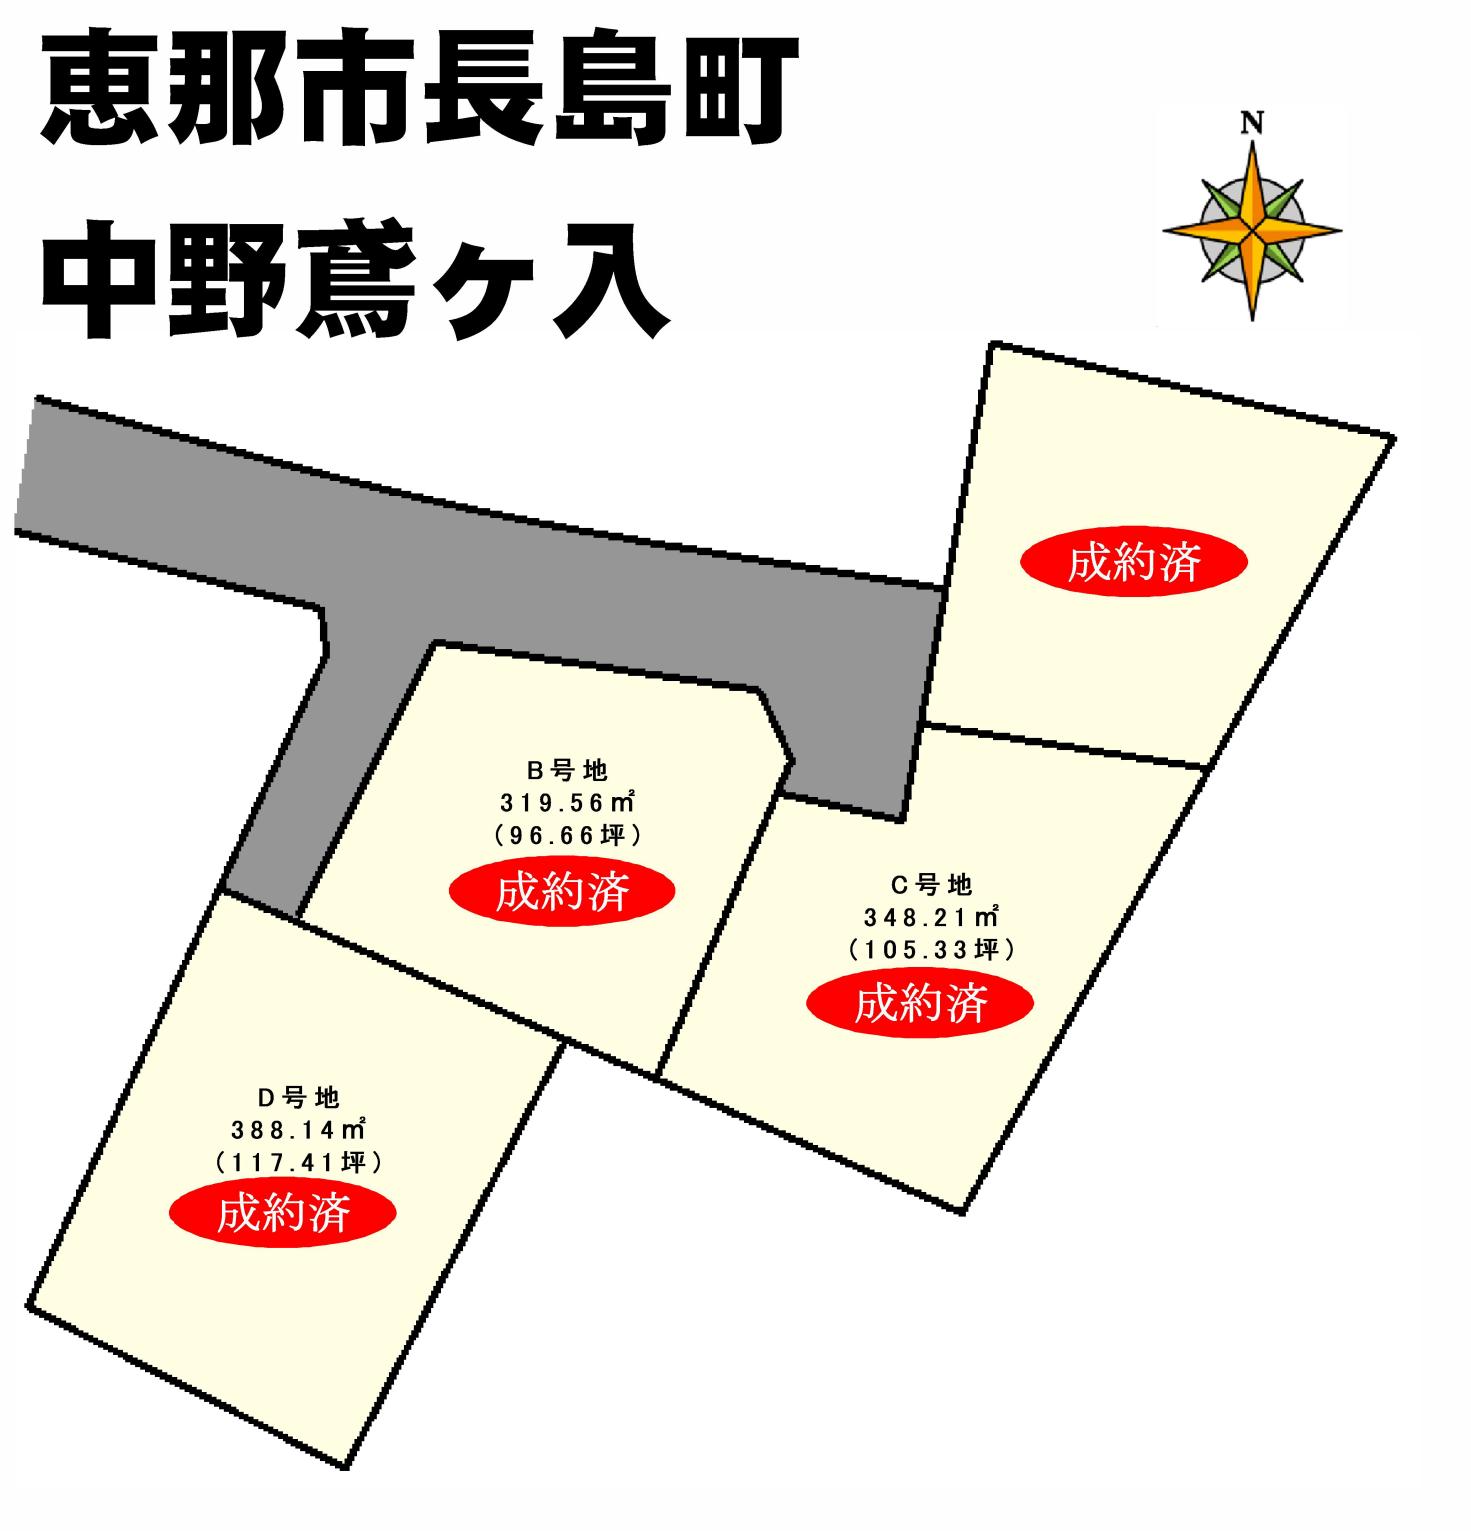 【ご成約済】恵那市長島町中野鳶ヶ入の土地|4区画分譲地|建築条件付き売地